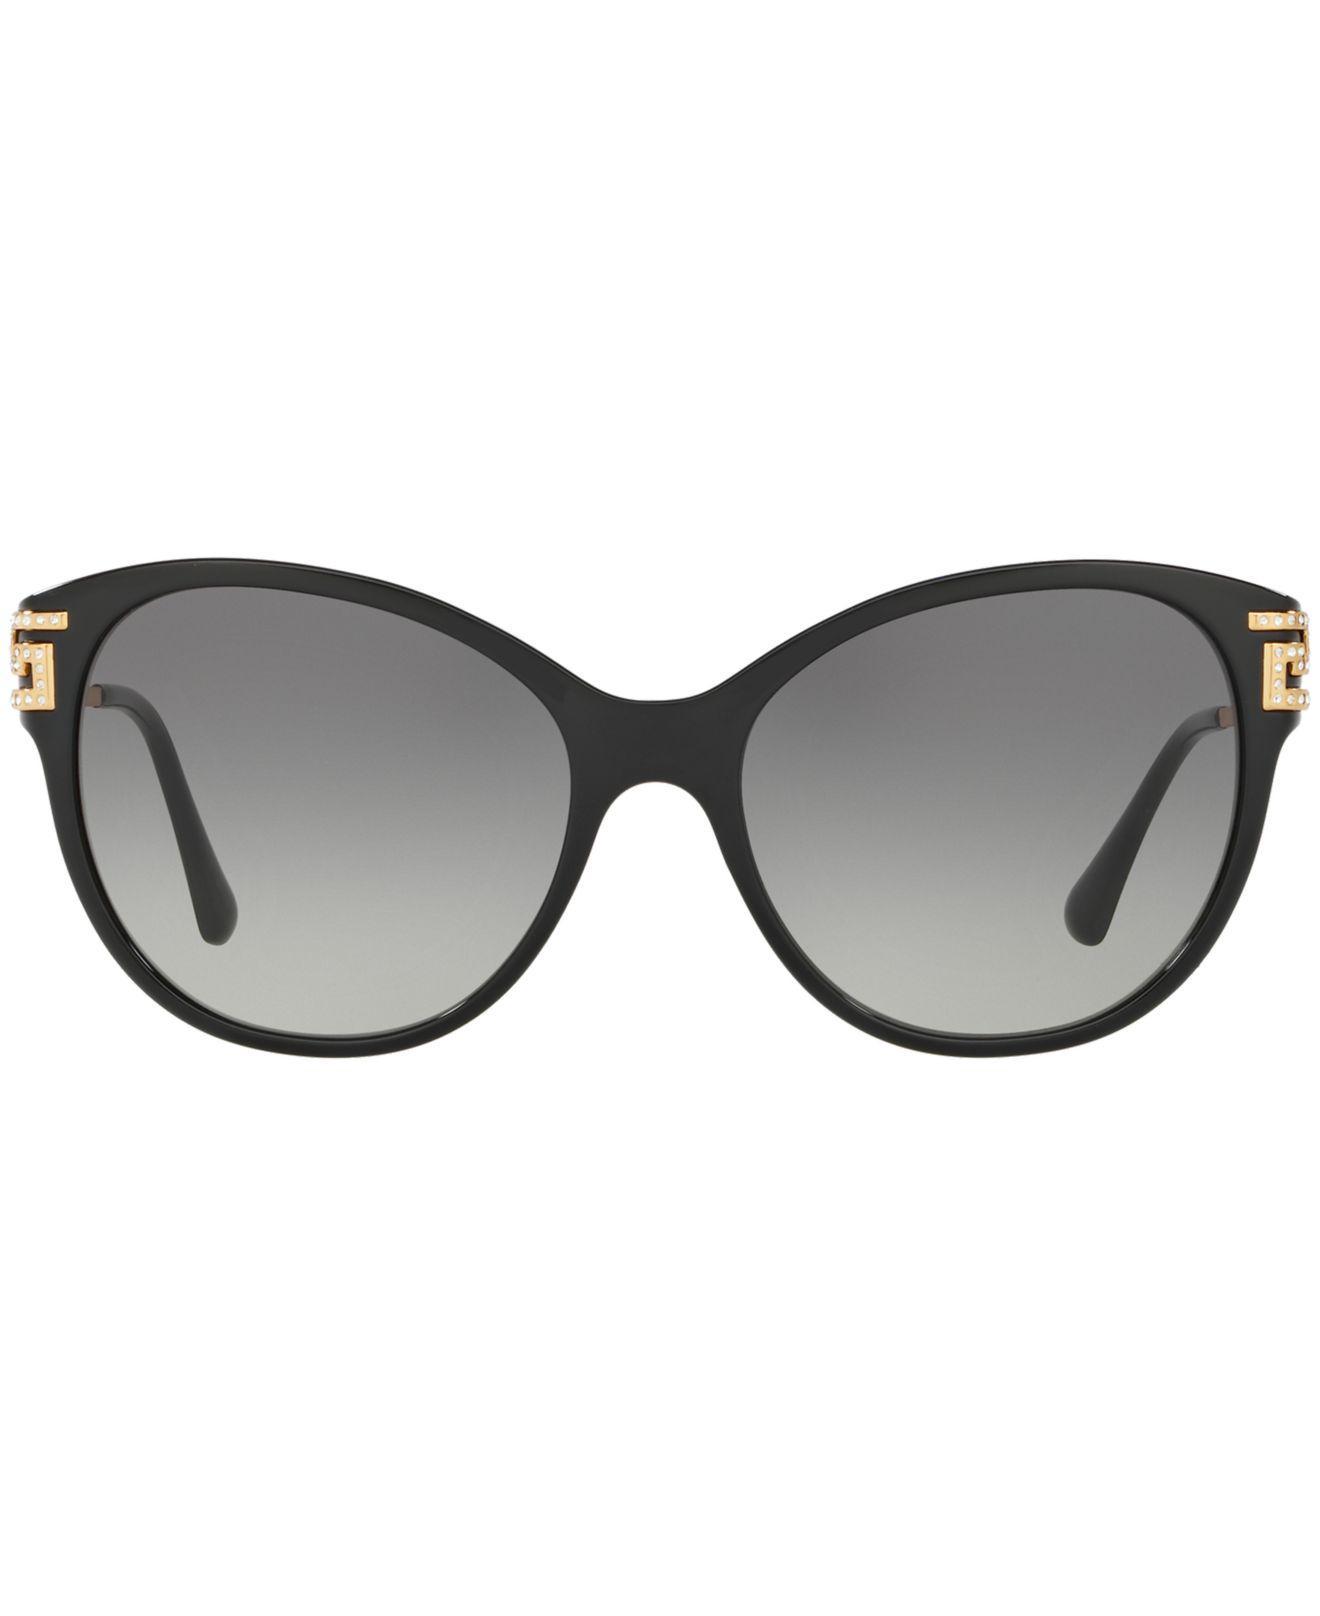 fe0d32aab2e50 Lyst - Versace Sunglasses